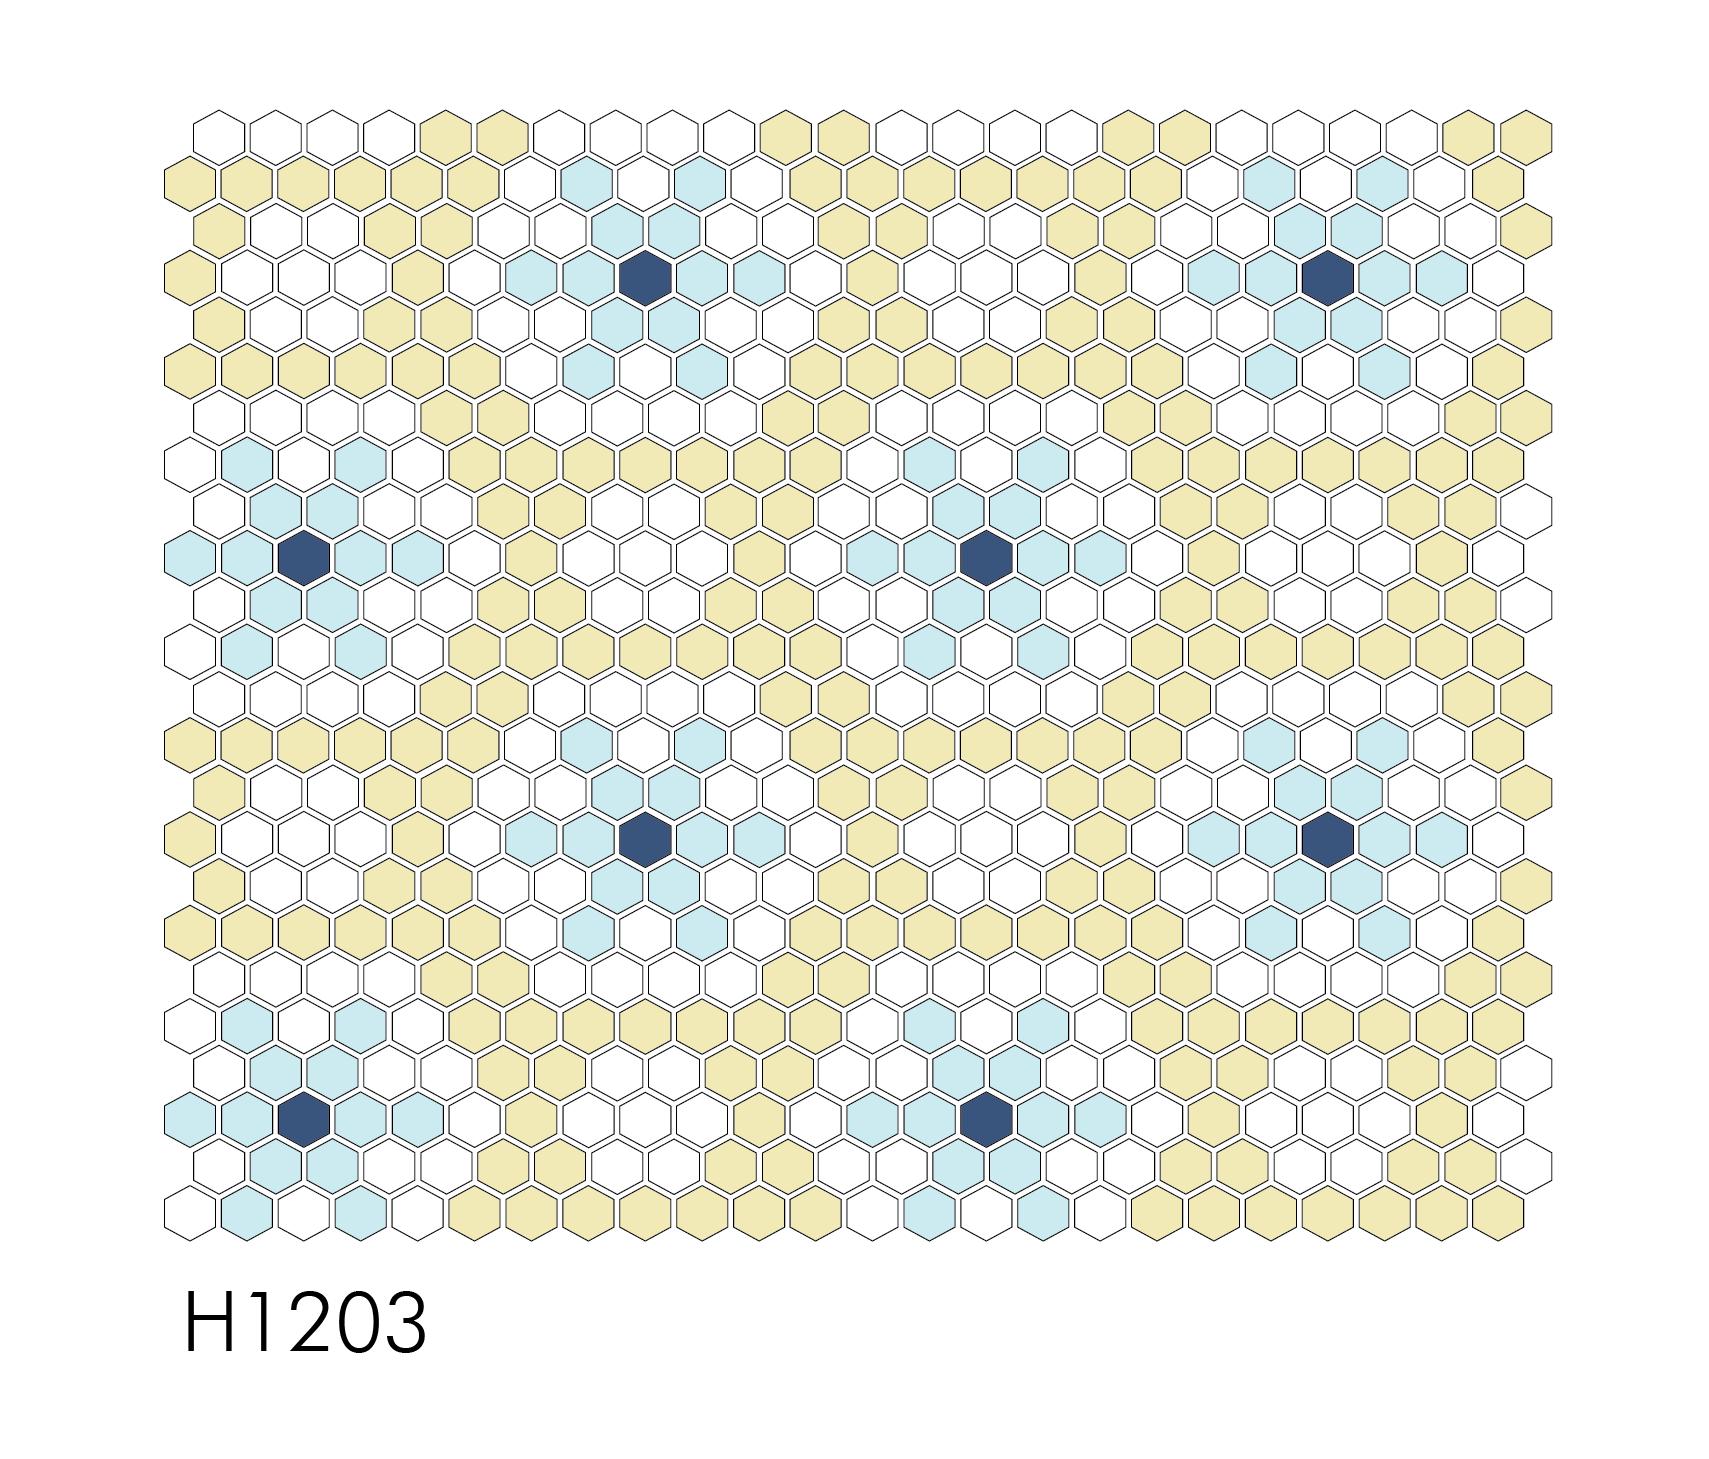 "H1203 Falling Snow 1"" Hexagon"